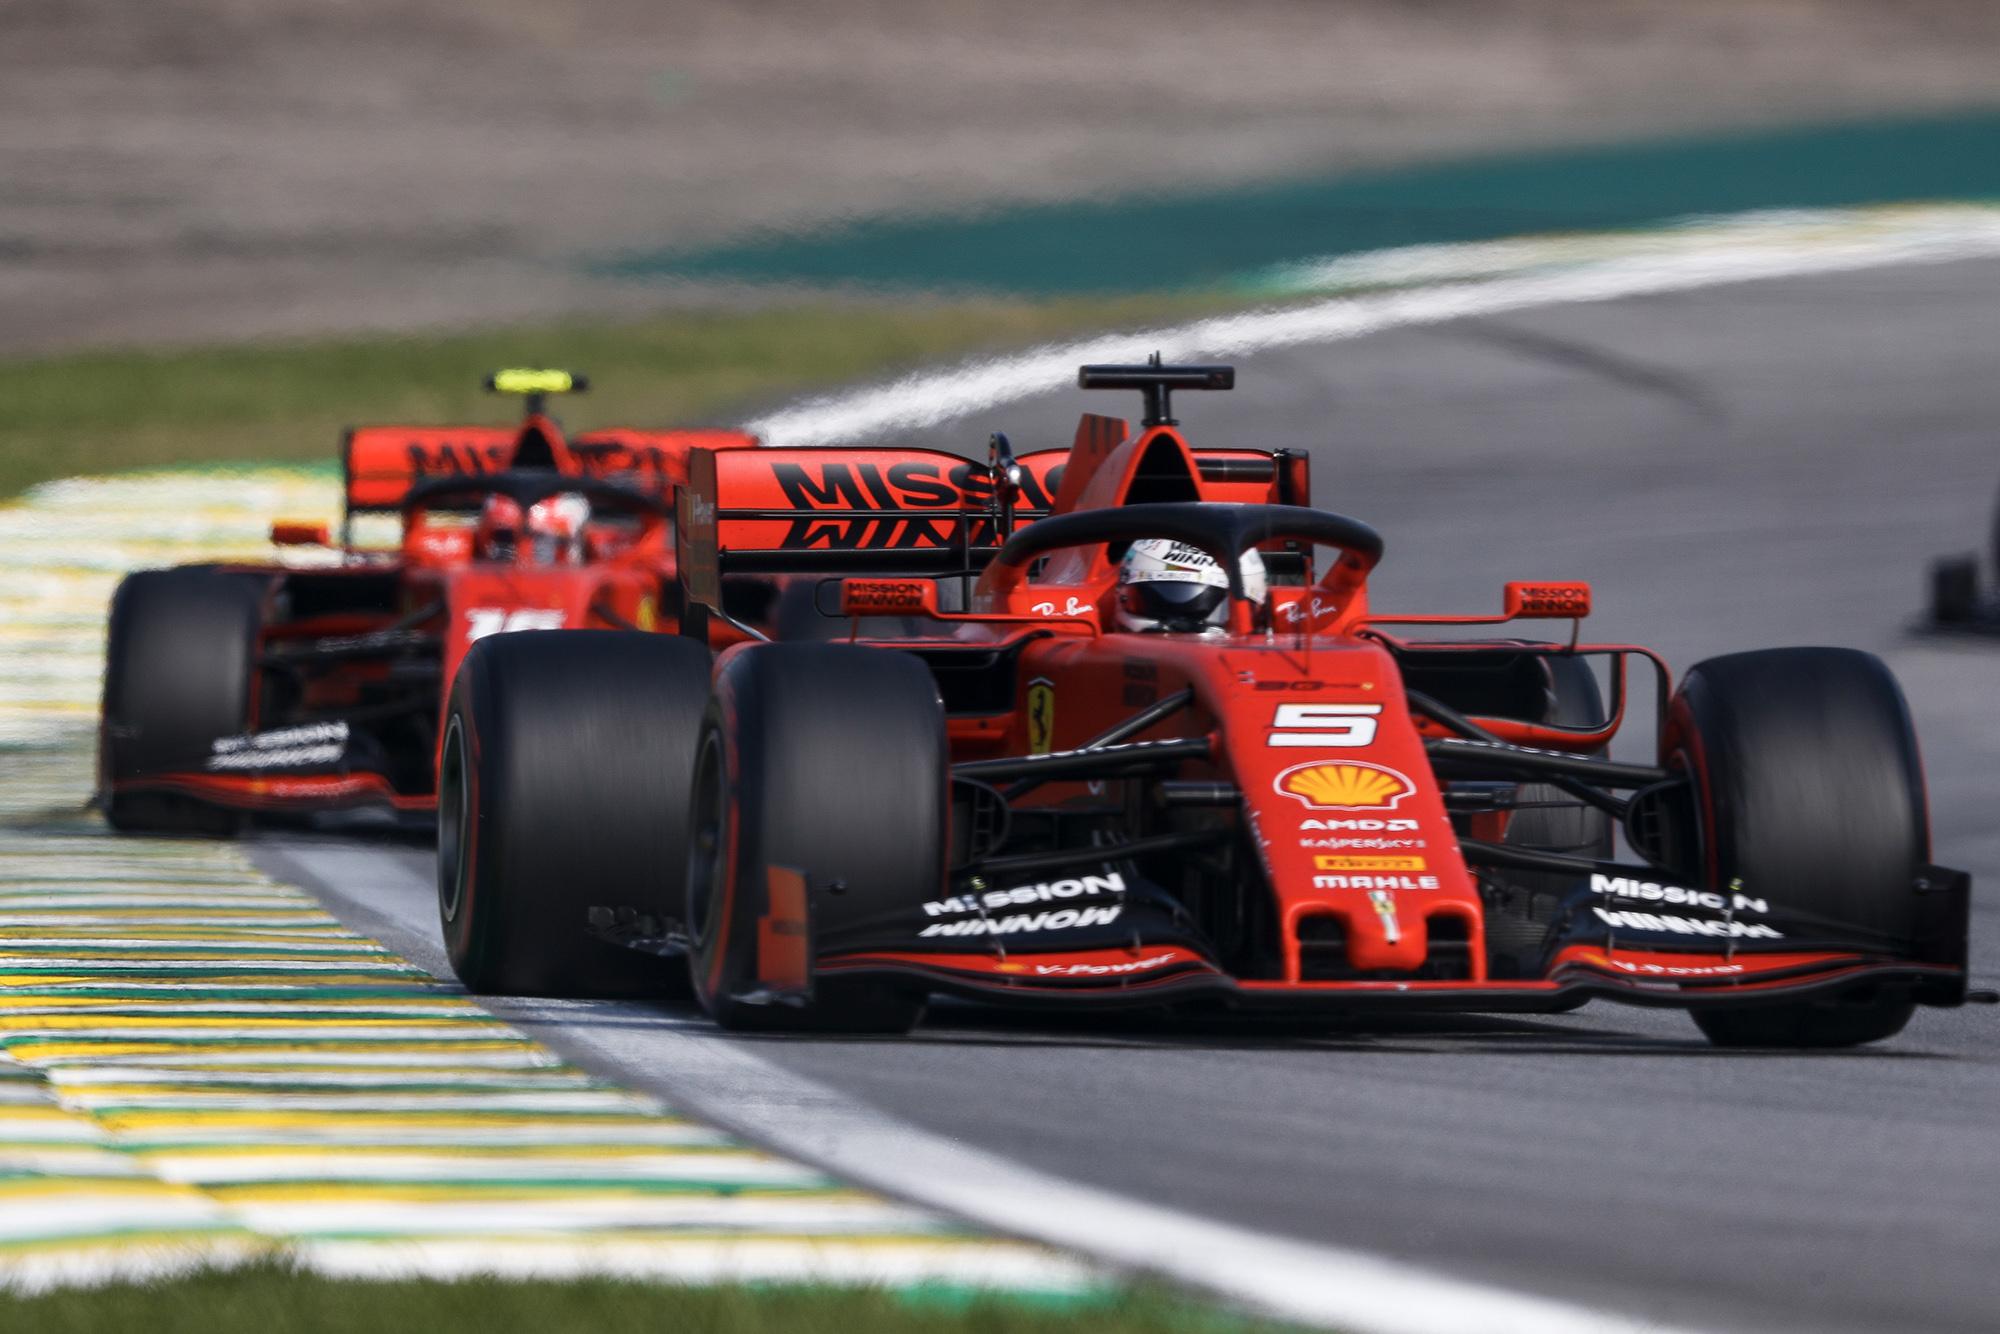 Vettel leads Leclerc at the 2019 Brazilian Grand Prix